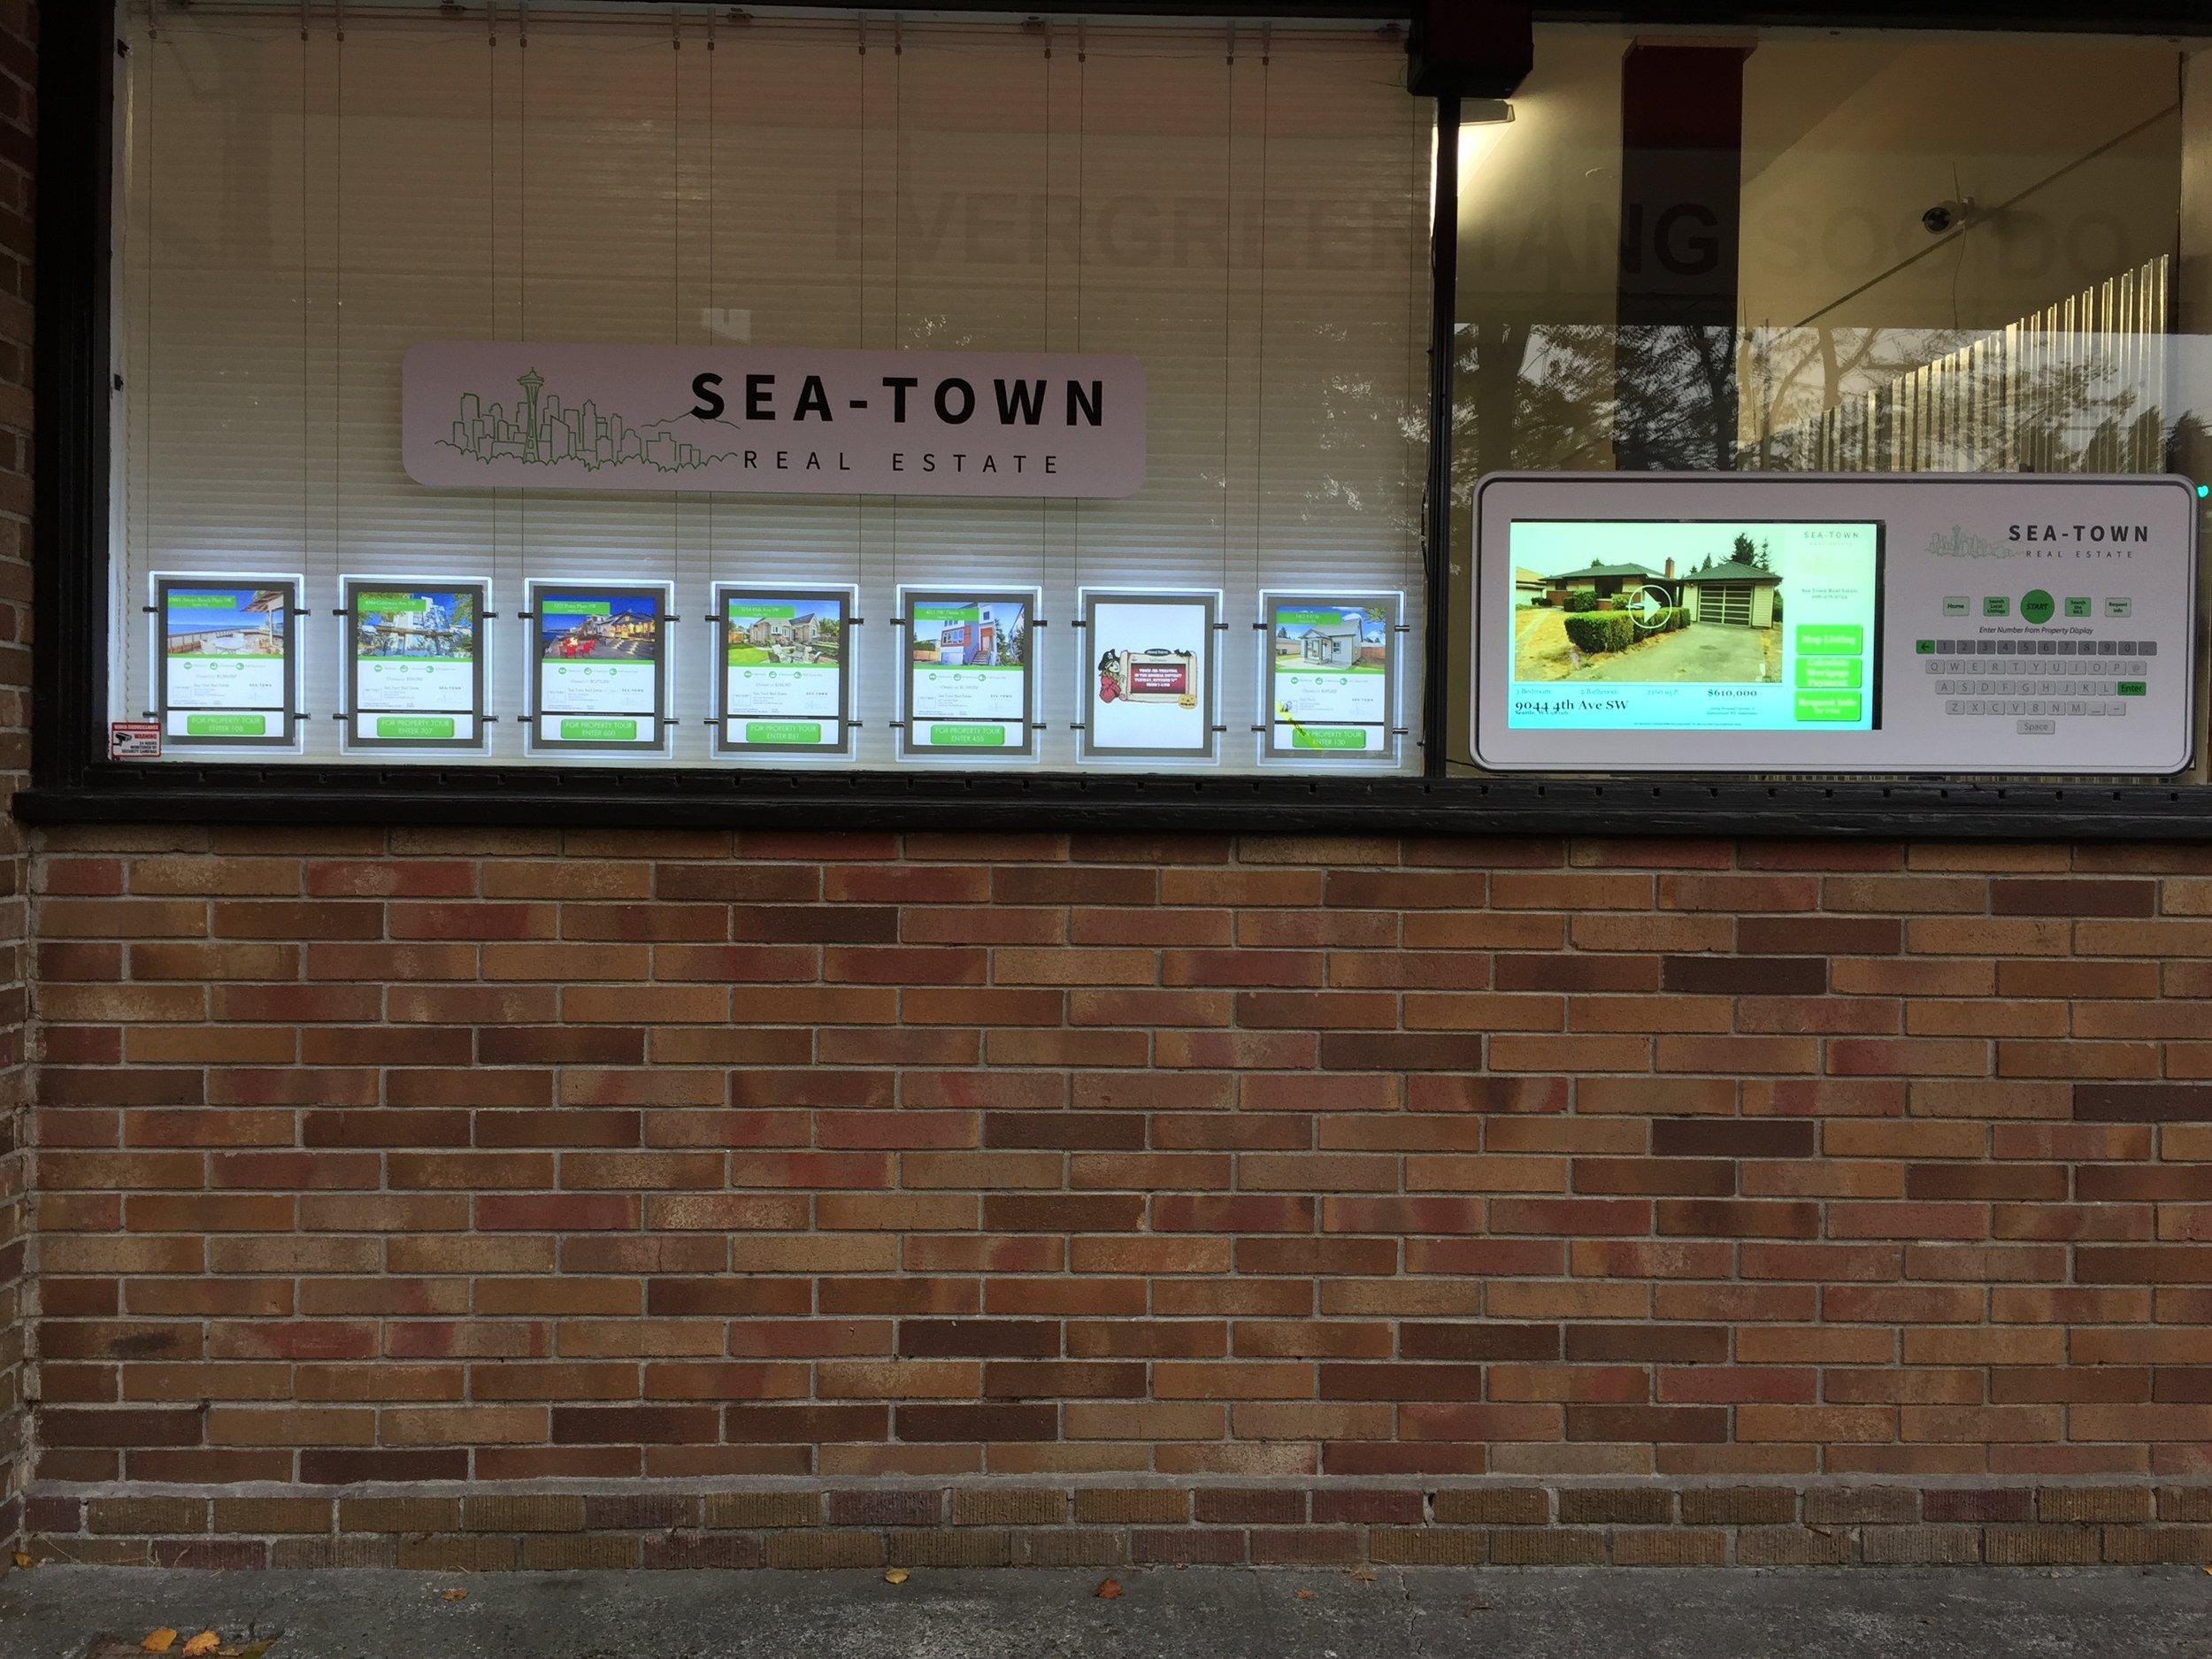 Sea-Town Real Estate - interactive display window.JPG